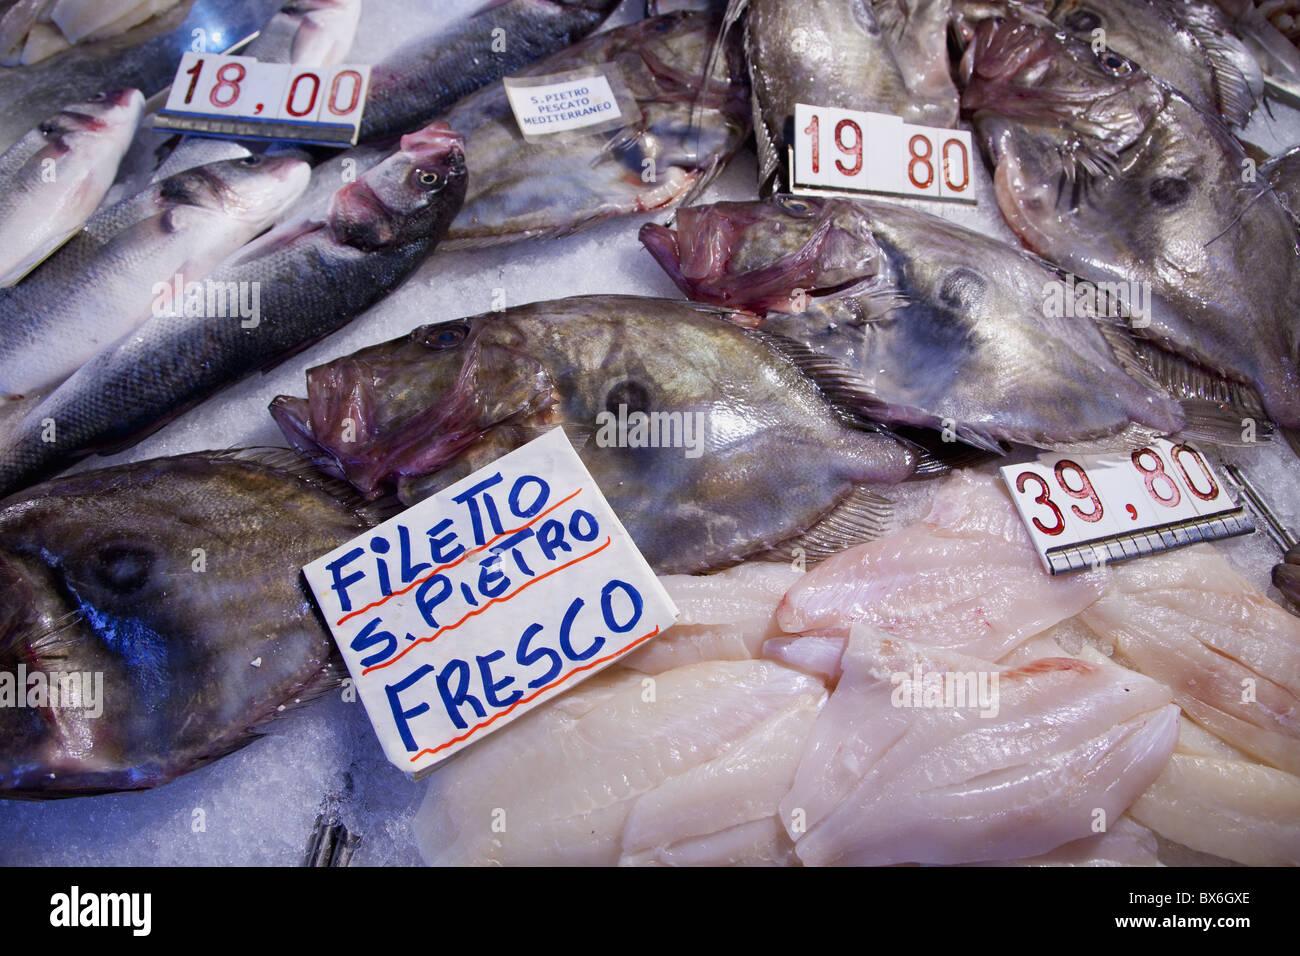 Fish for sale at a market stall, Rialto Markets, Venice, Veneto, Italy, Europe - Stock Image